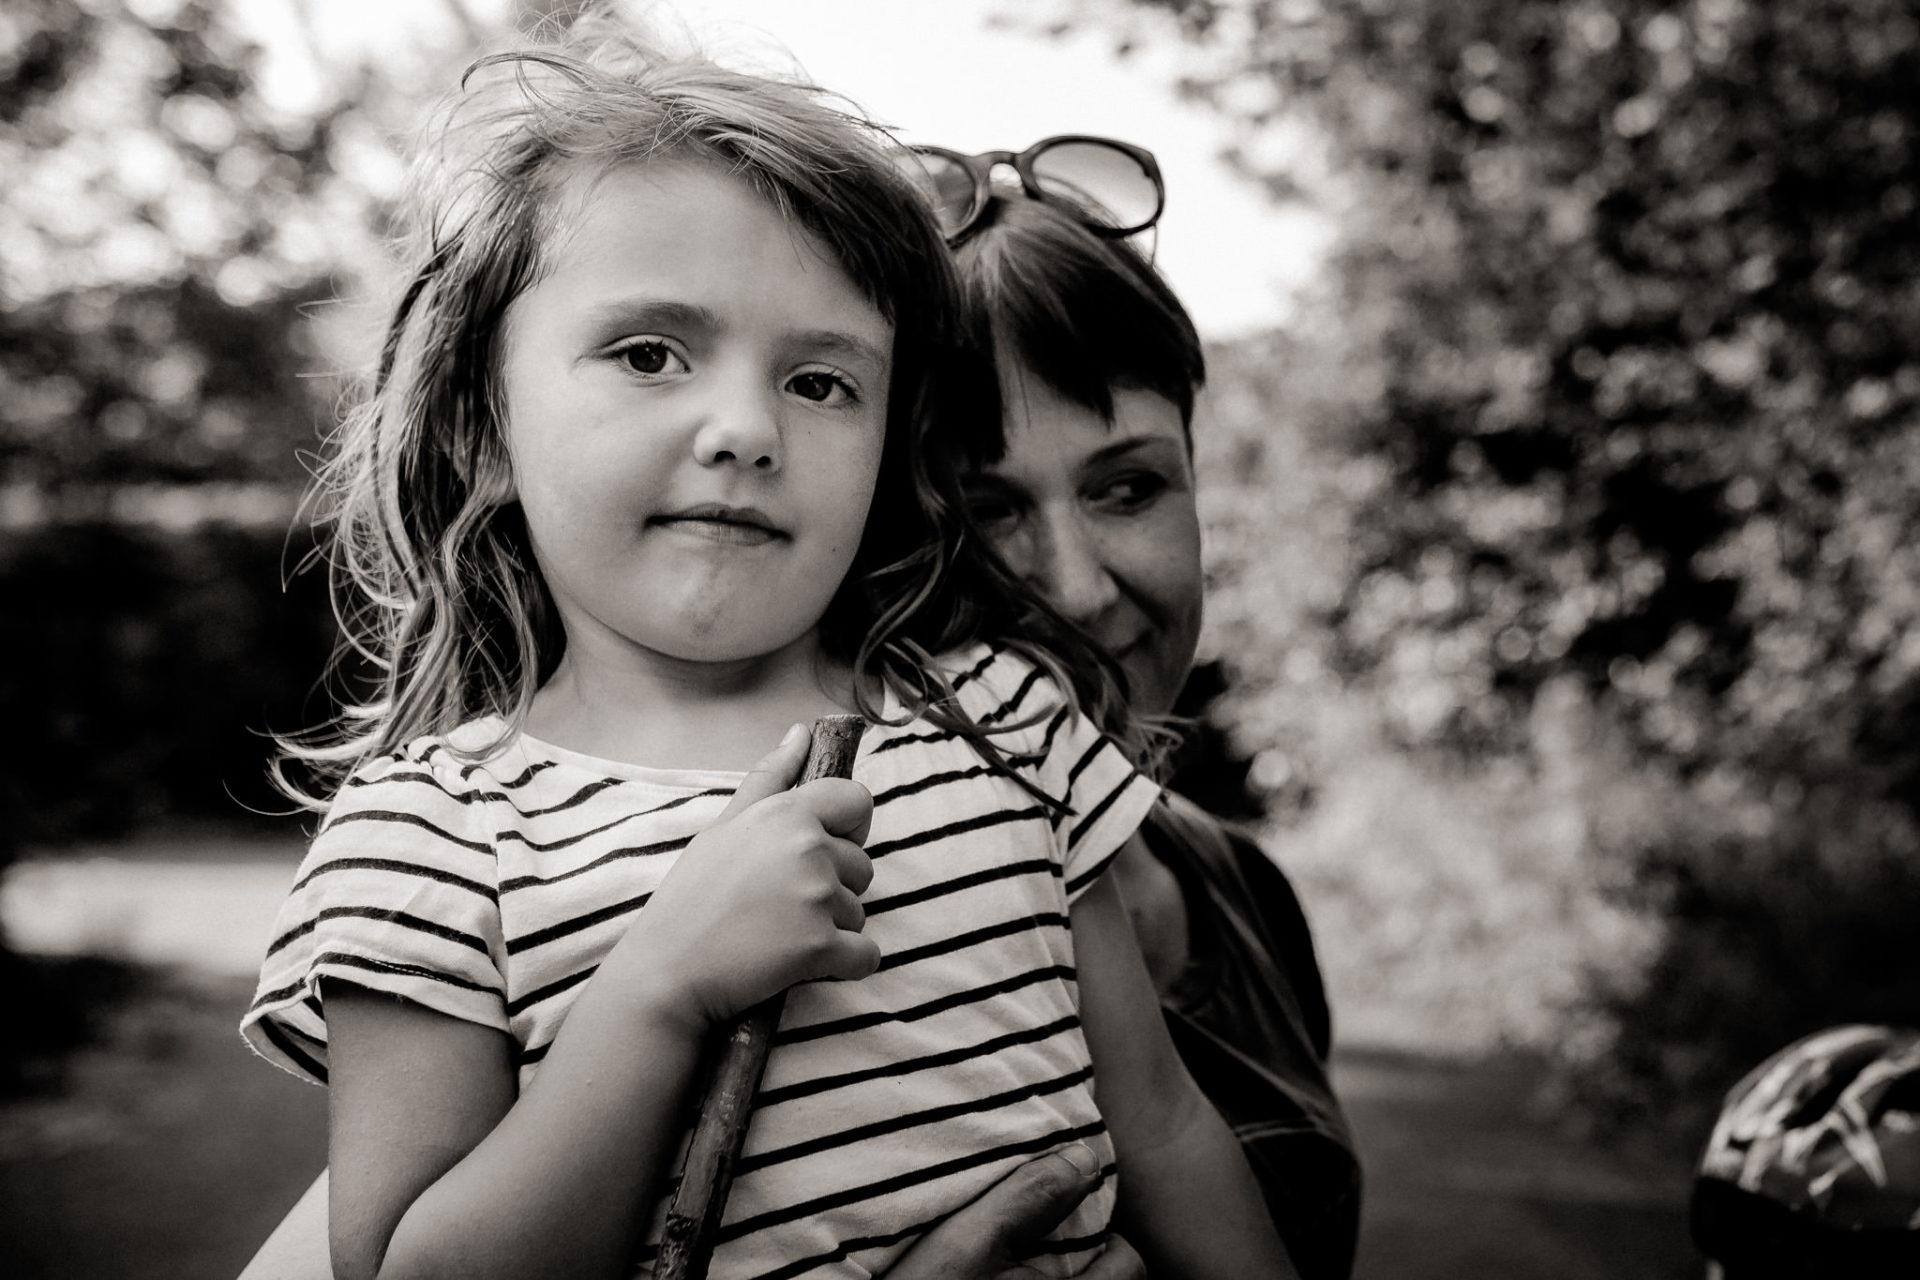 ungestellte emotionale kreative familienbilder-familienfotograf mainz stuttgart-großfamilie Ausflug im Wald-schwangerschaft-babybauch shooting-familienbilder karlsruhe